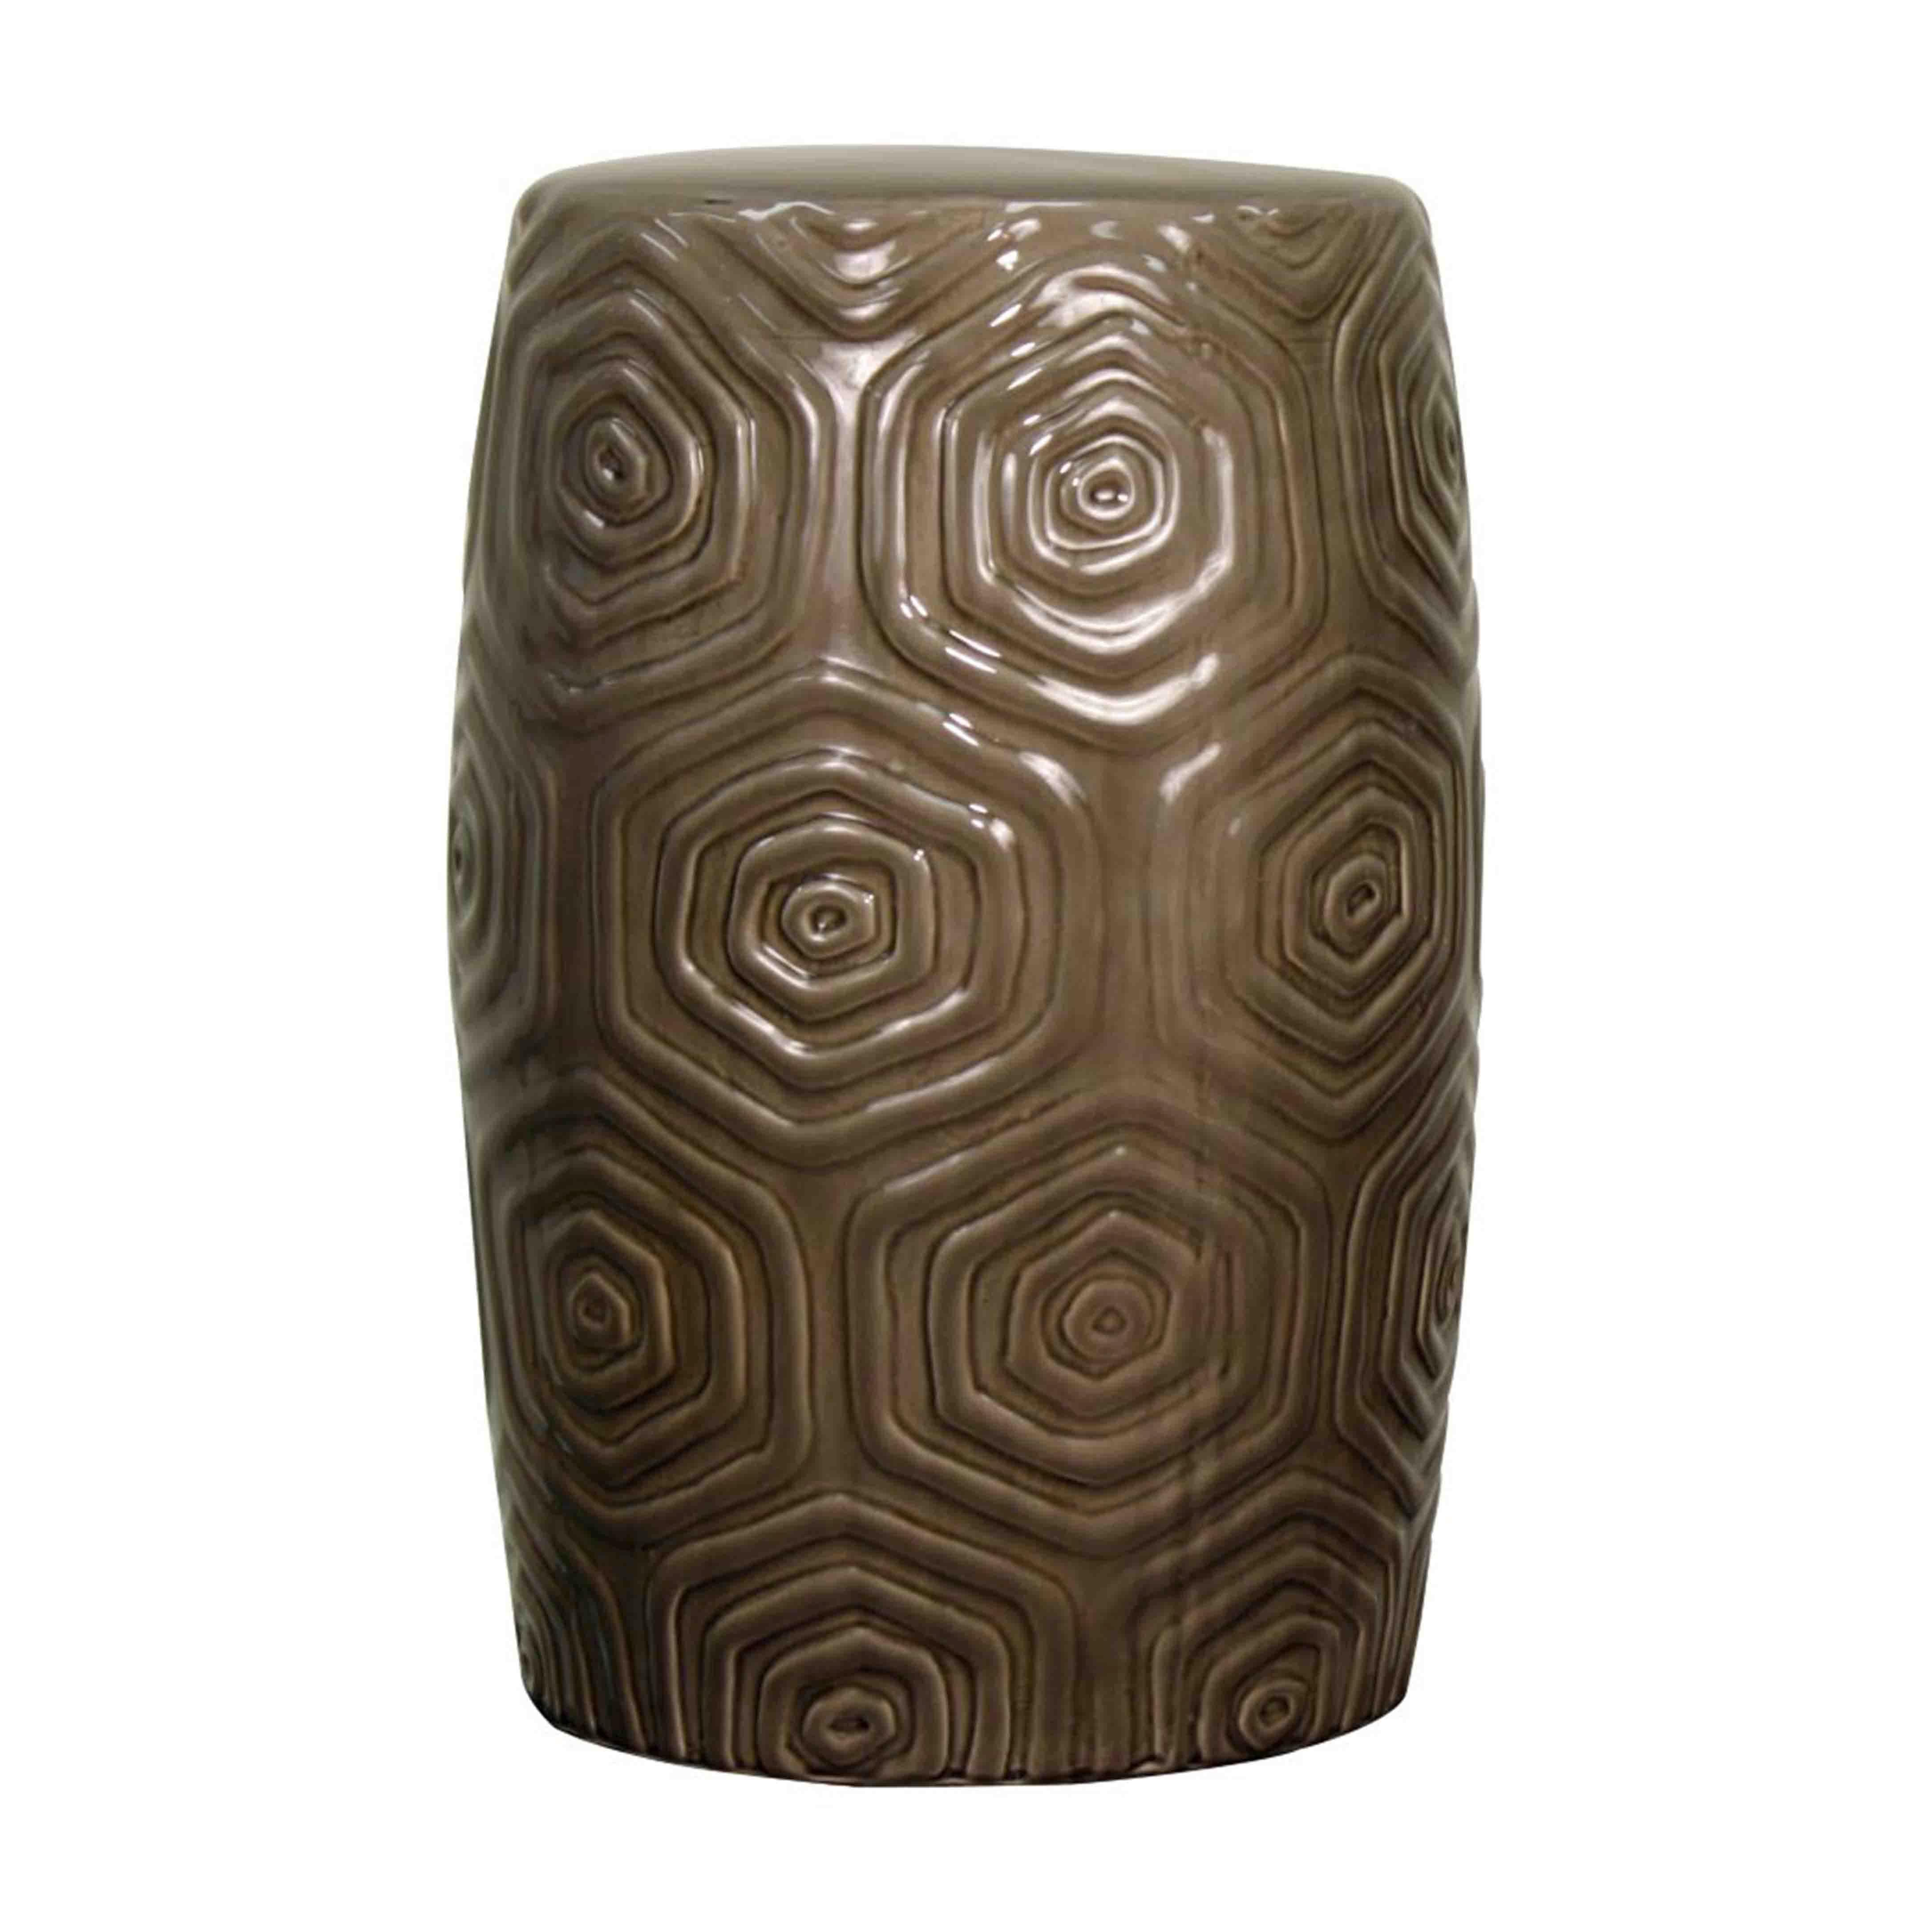 Daze Ceramic Garden Stool, Gray/439720-G | Interior & Architectural ...